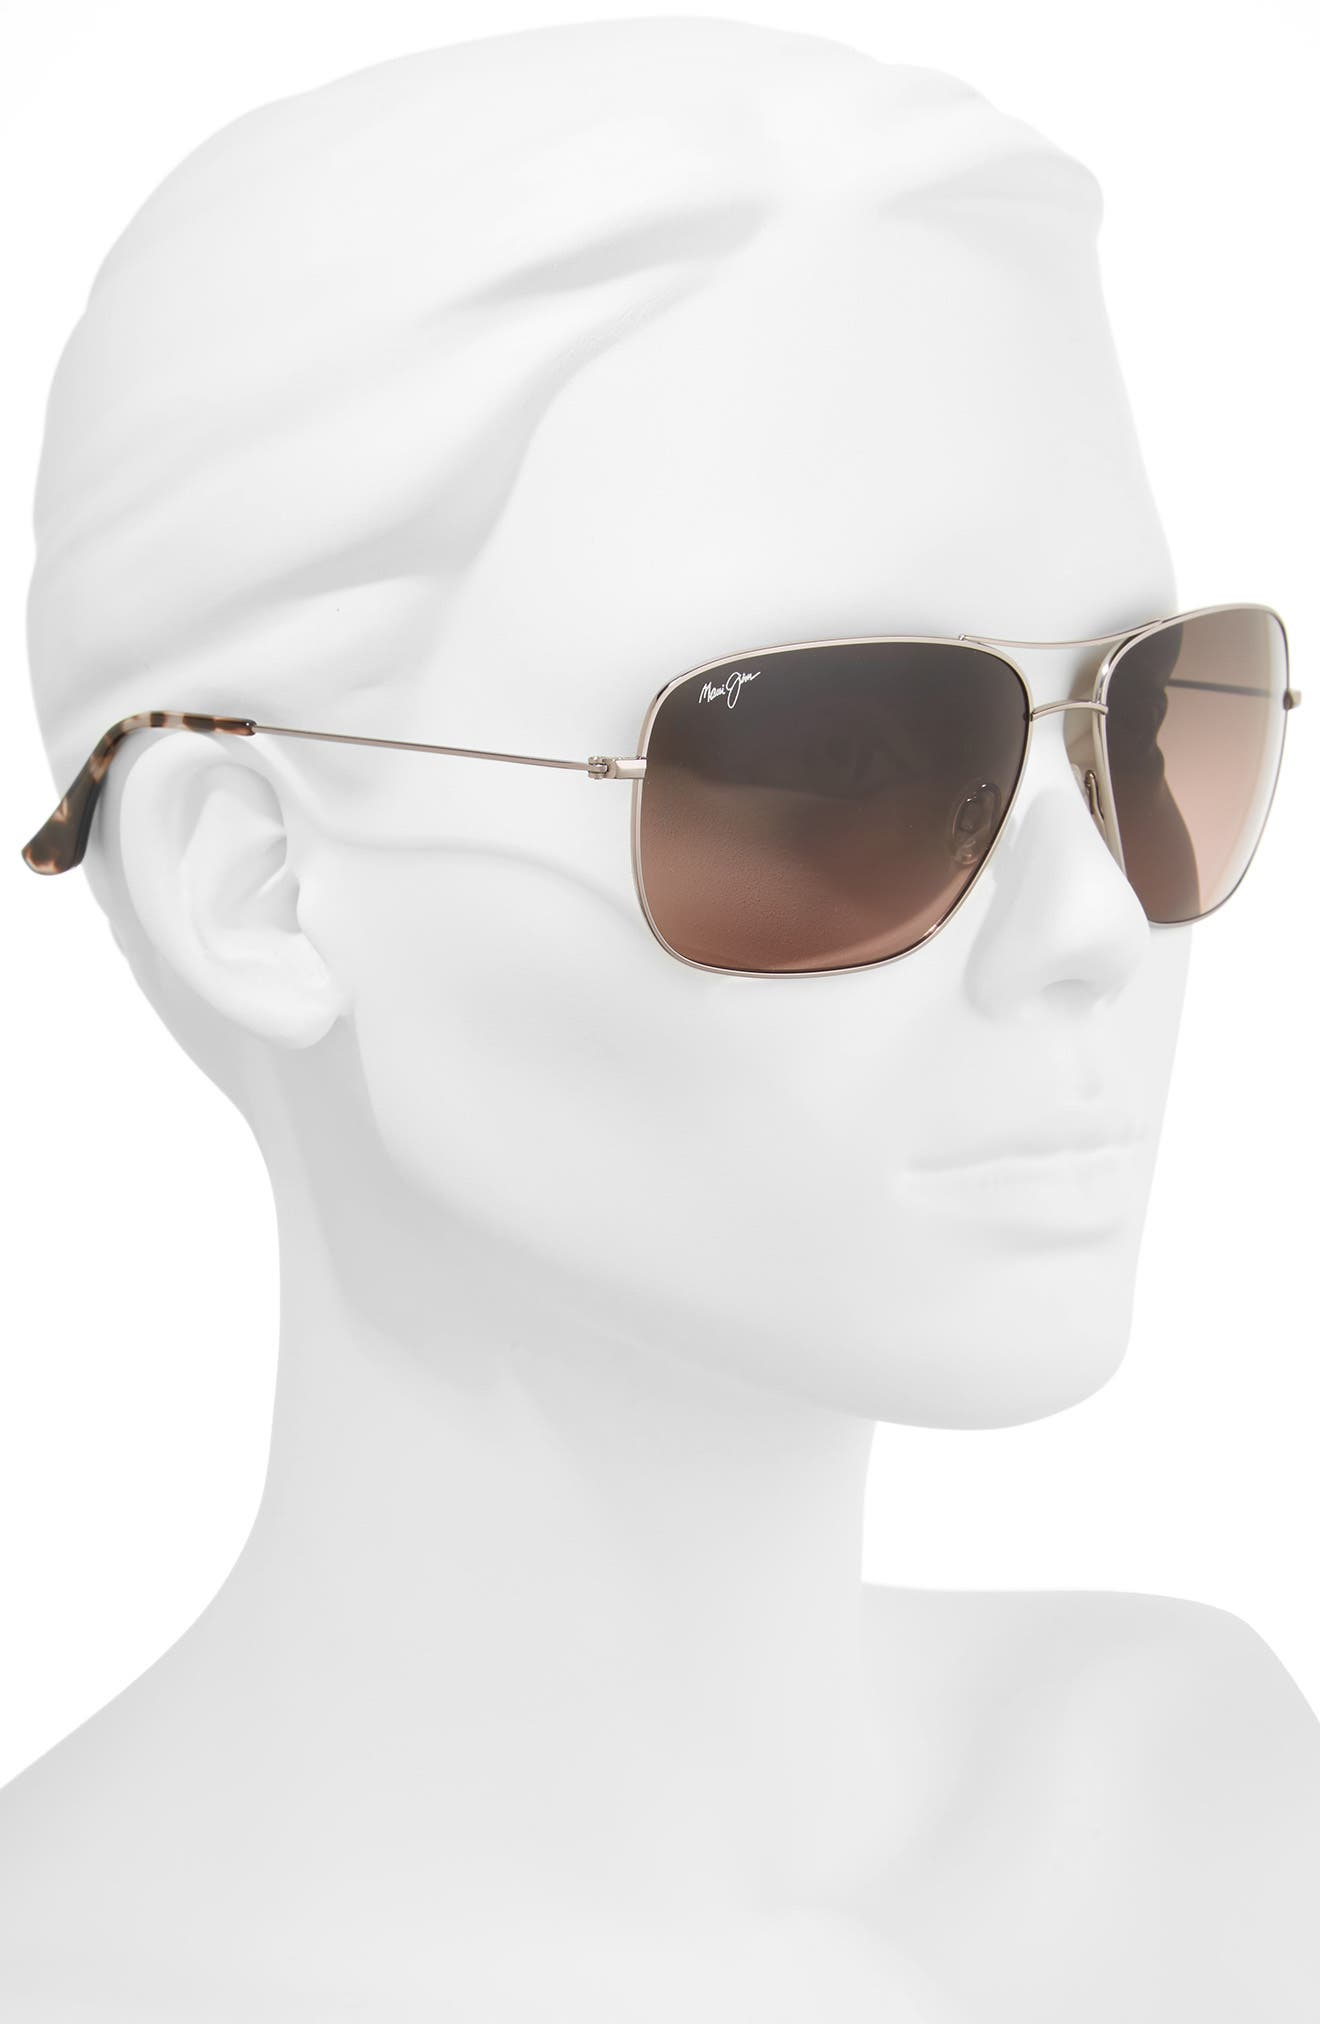 Cook Pines 63mm Polarized Titanium Aviator Sunglasses,                             Alternate thumbnail 7, color,